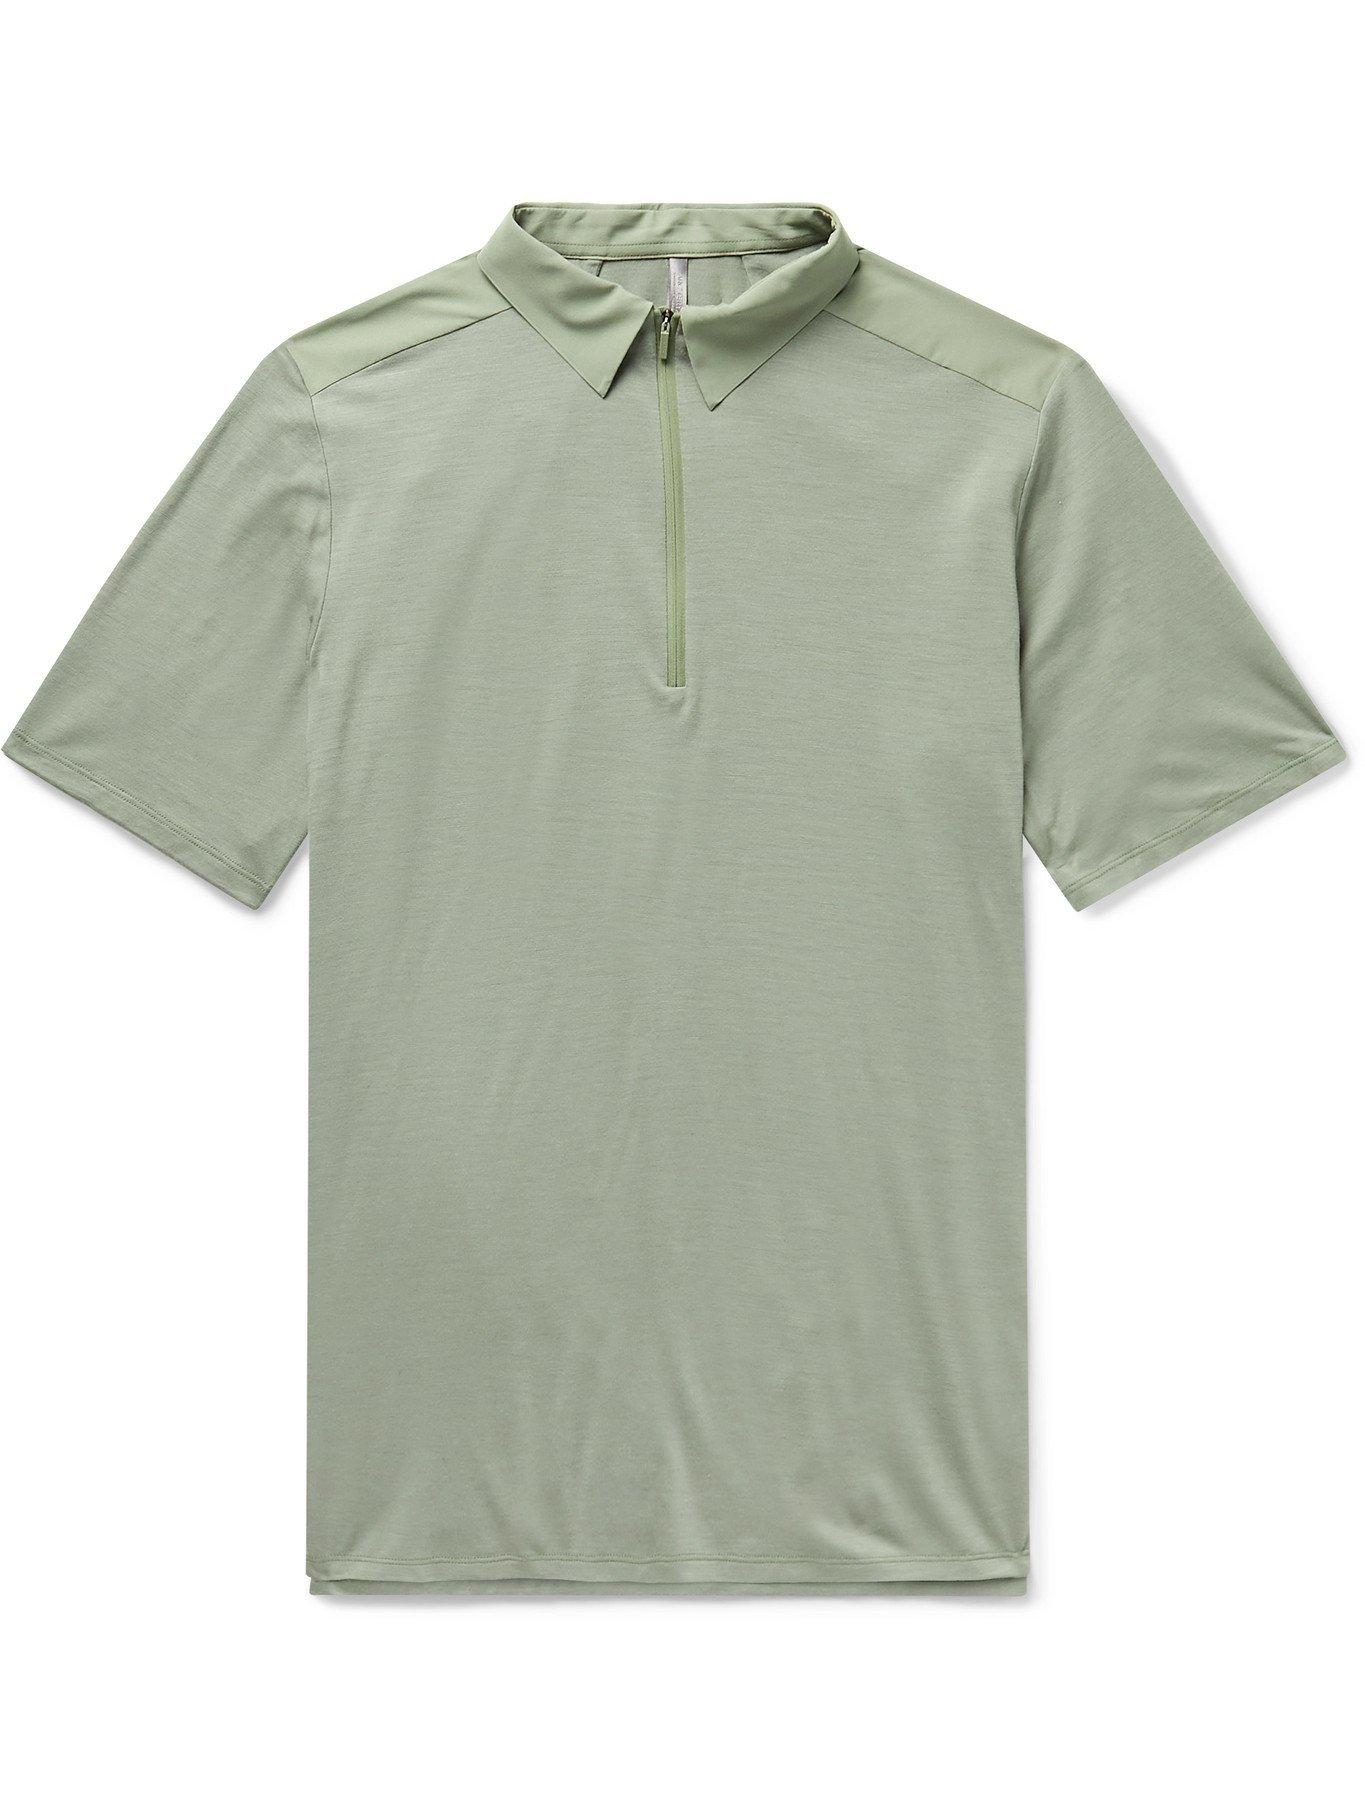 VEILANCE - Frame Shell-Trimmed Wool-Blend Polo Shirt - Gray